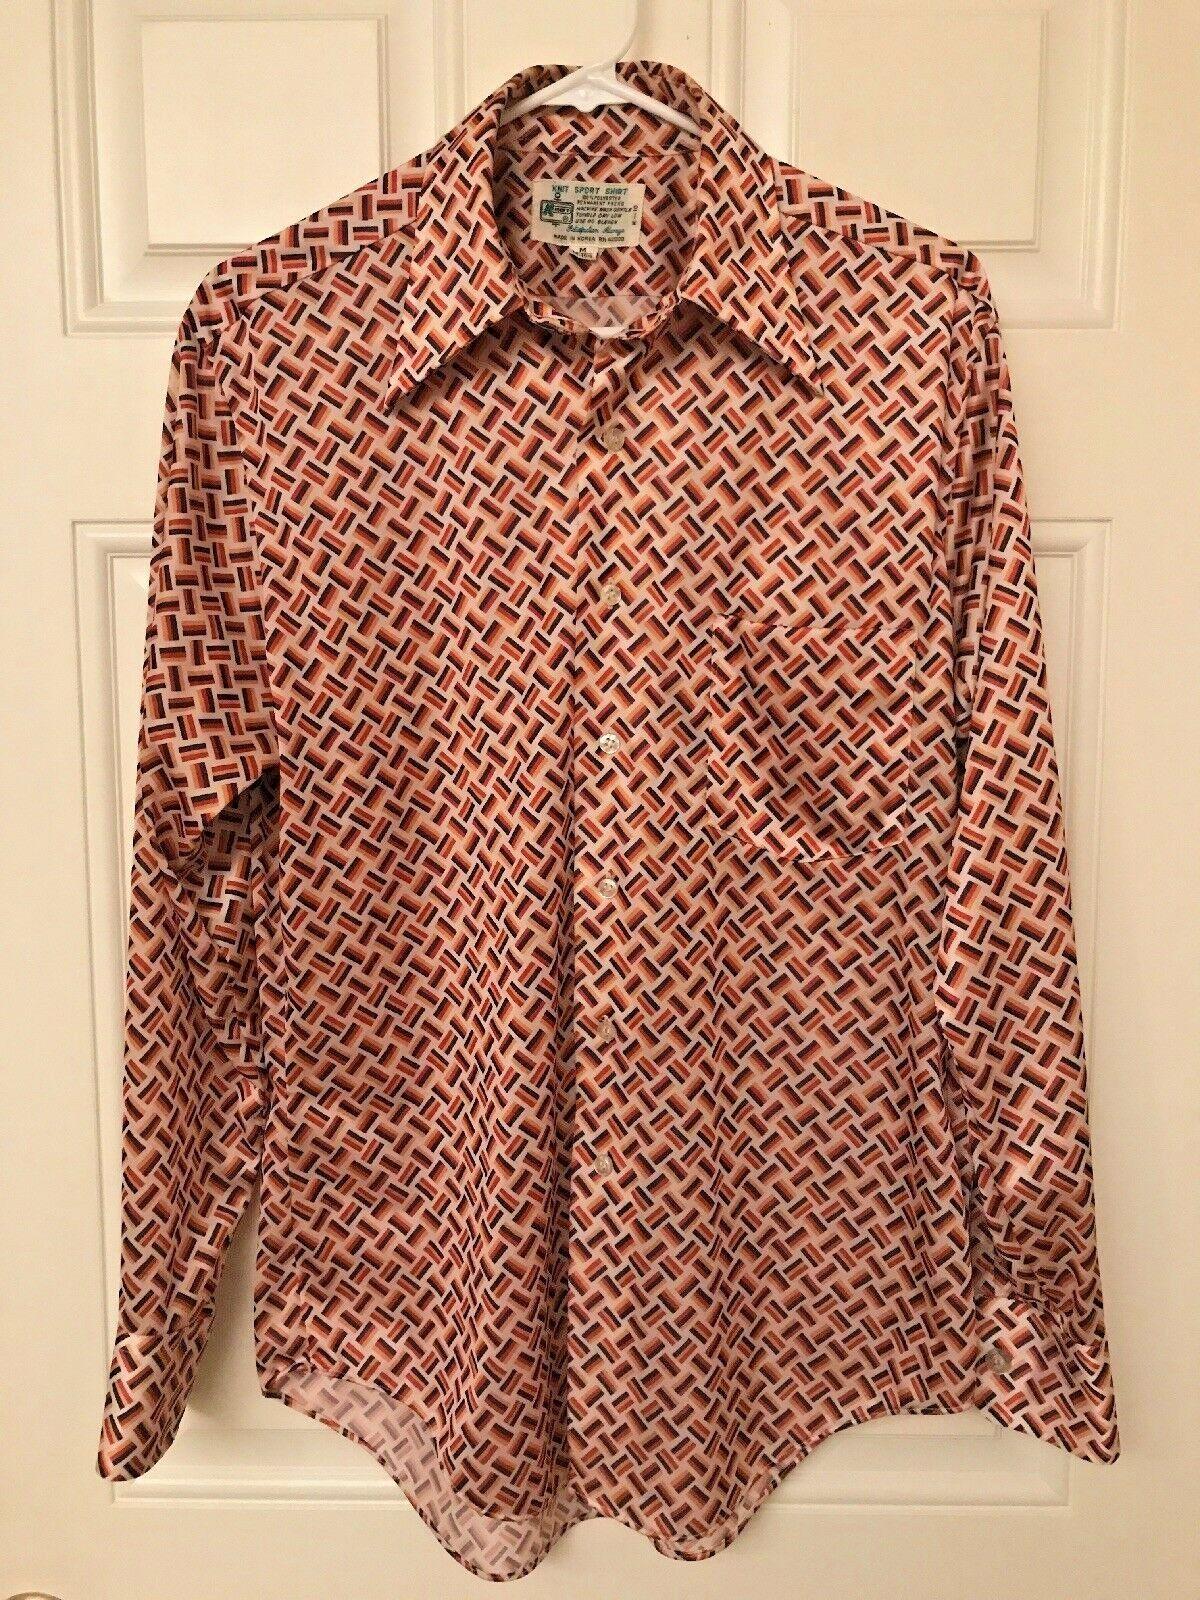 Knit Sport Shirt 70's Disco orange Geometric Made in Korea Medium 15-15 1 2